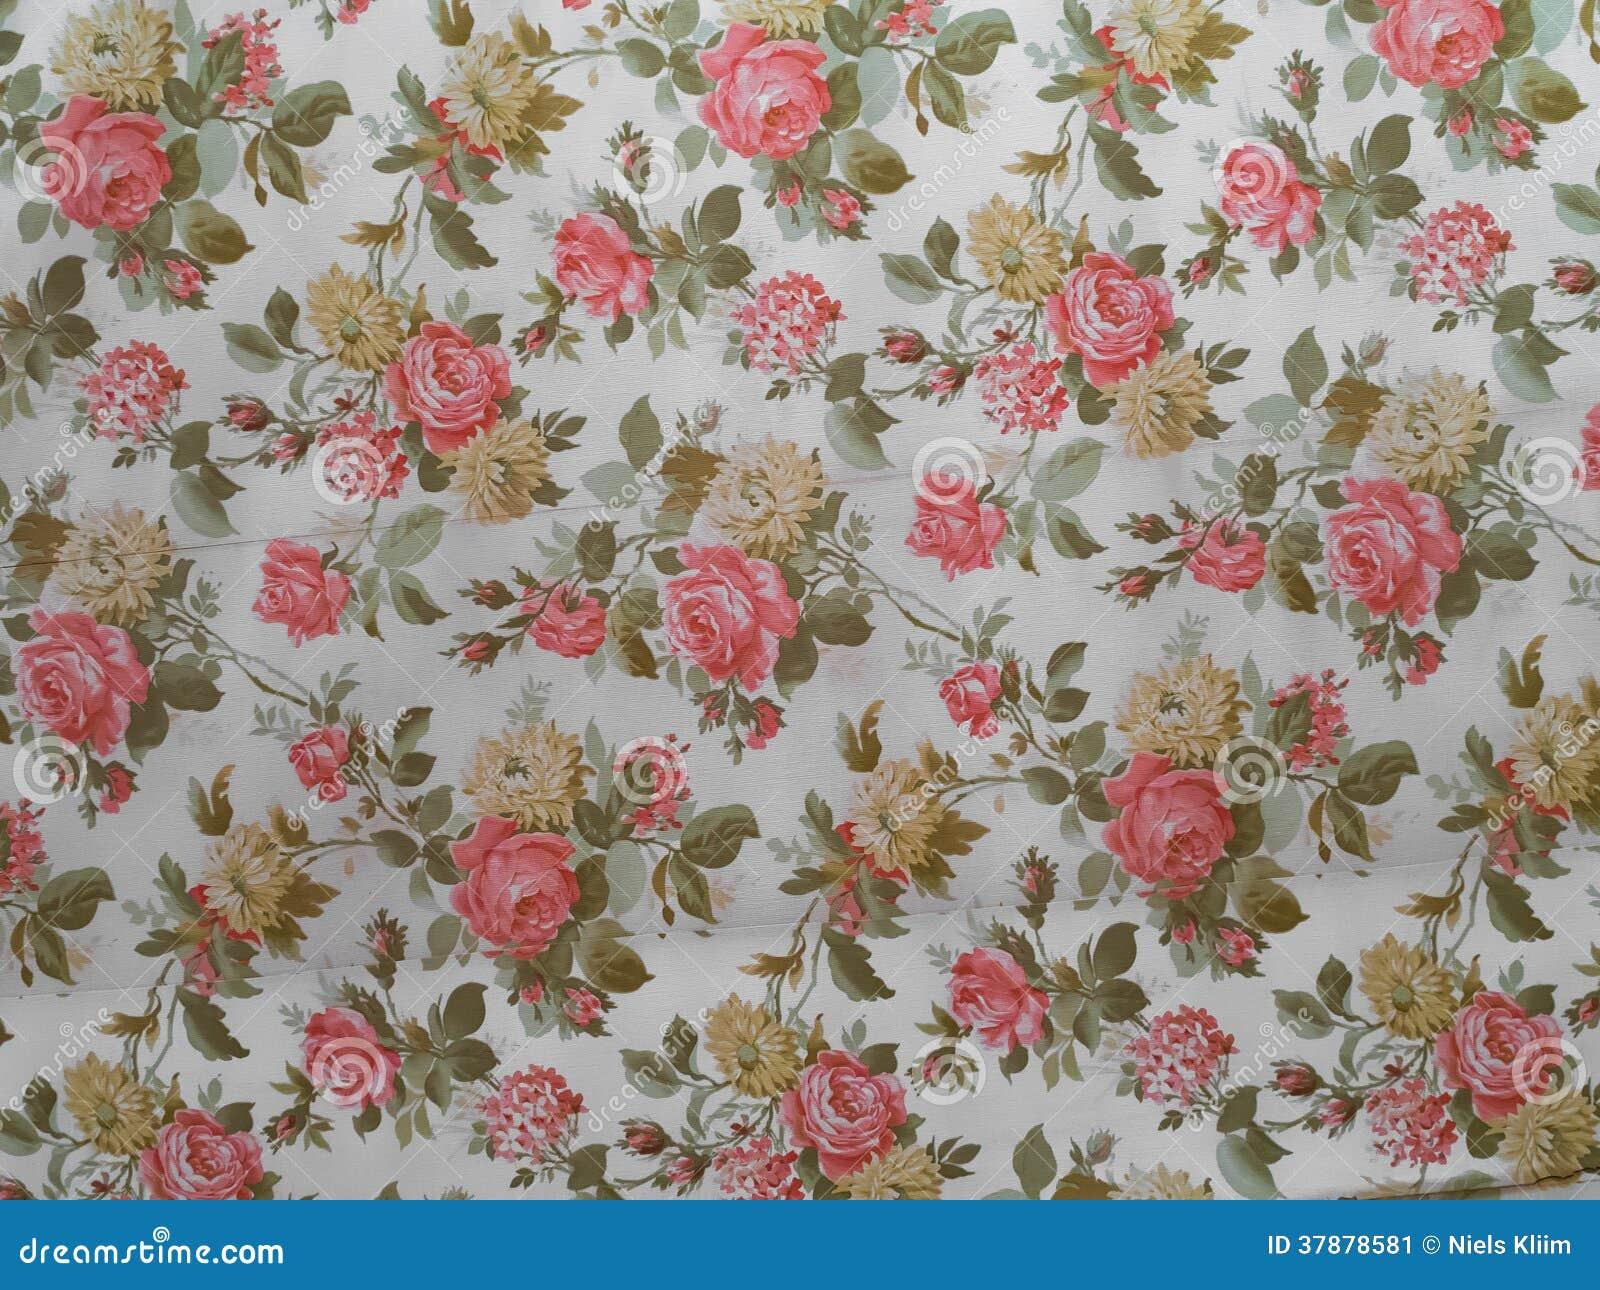 alte rose verzierte tapete stockbild bild 37878581. Black Bedroom Furniture Sets. Home Design Ideas